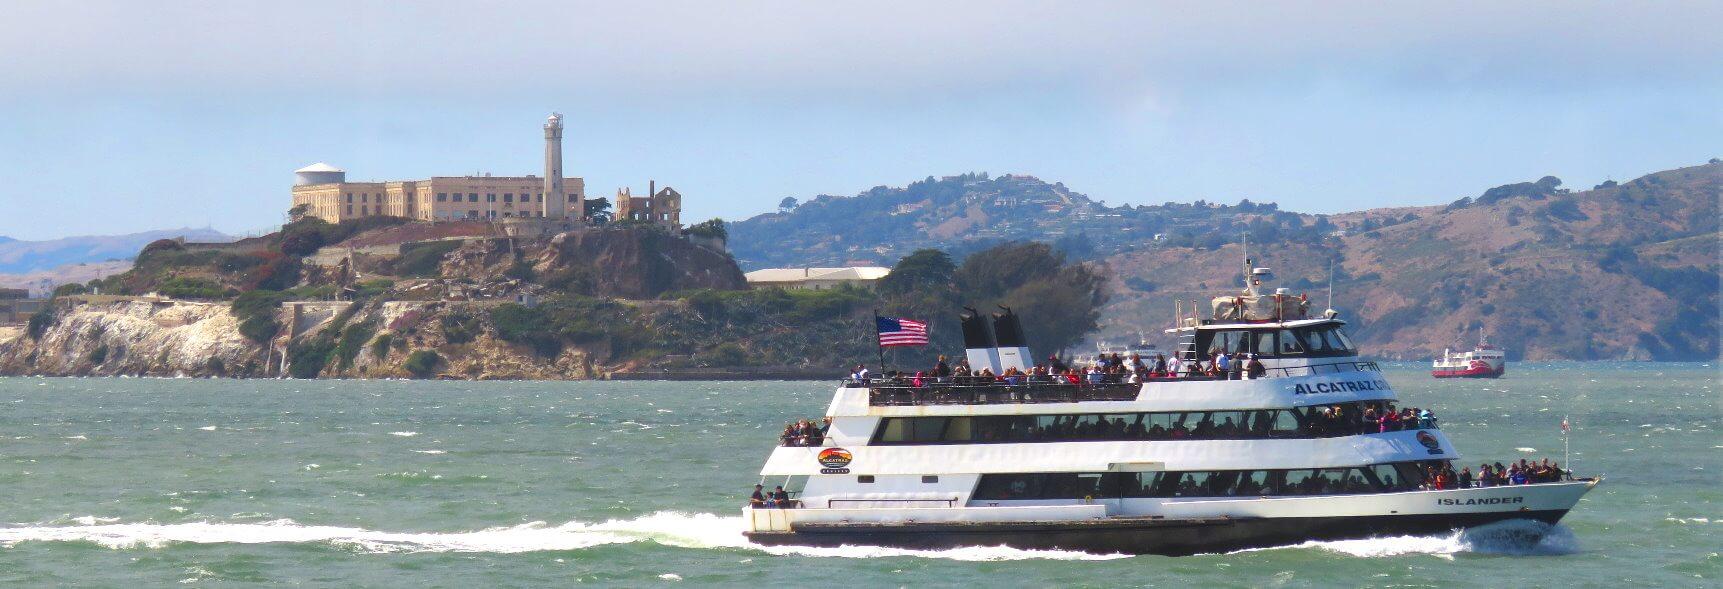 san_francisco_city_tour_and_bay_cruise_ferry_tour